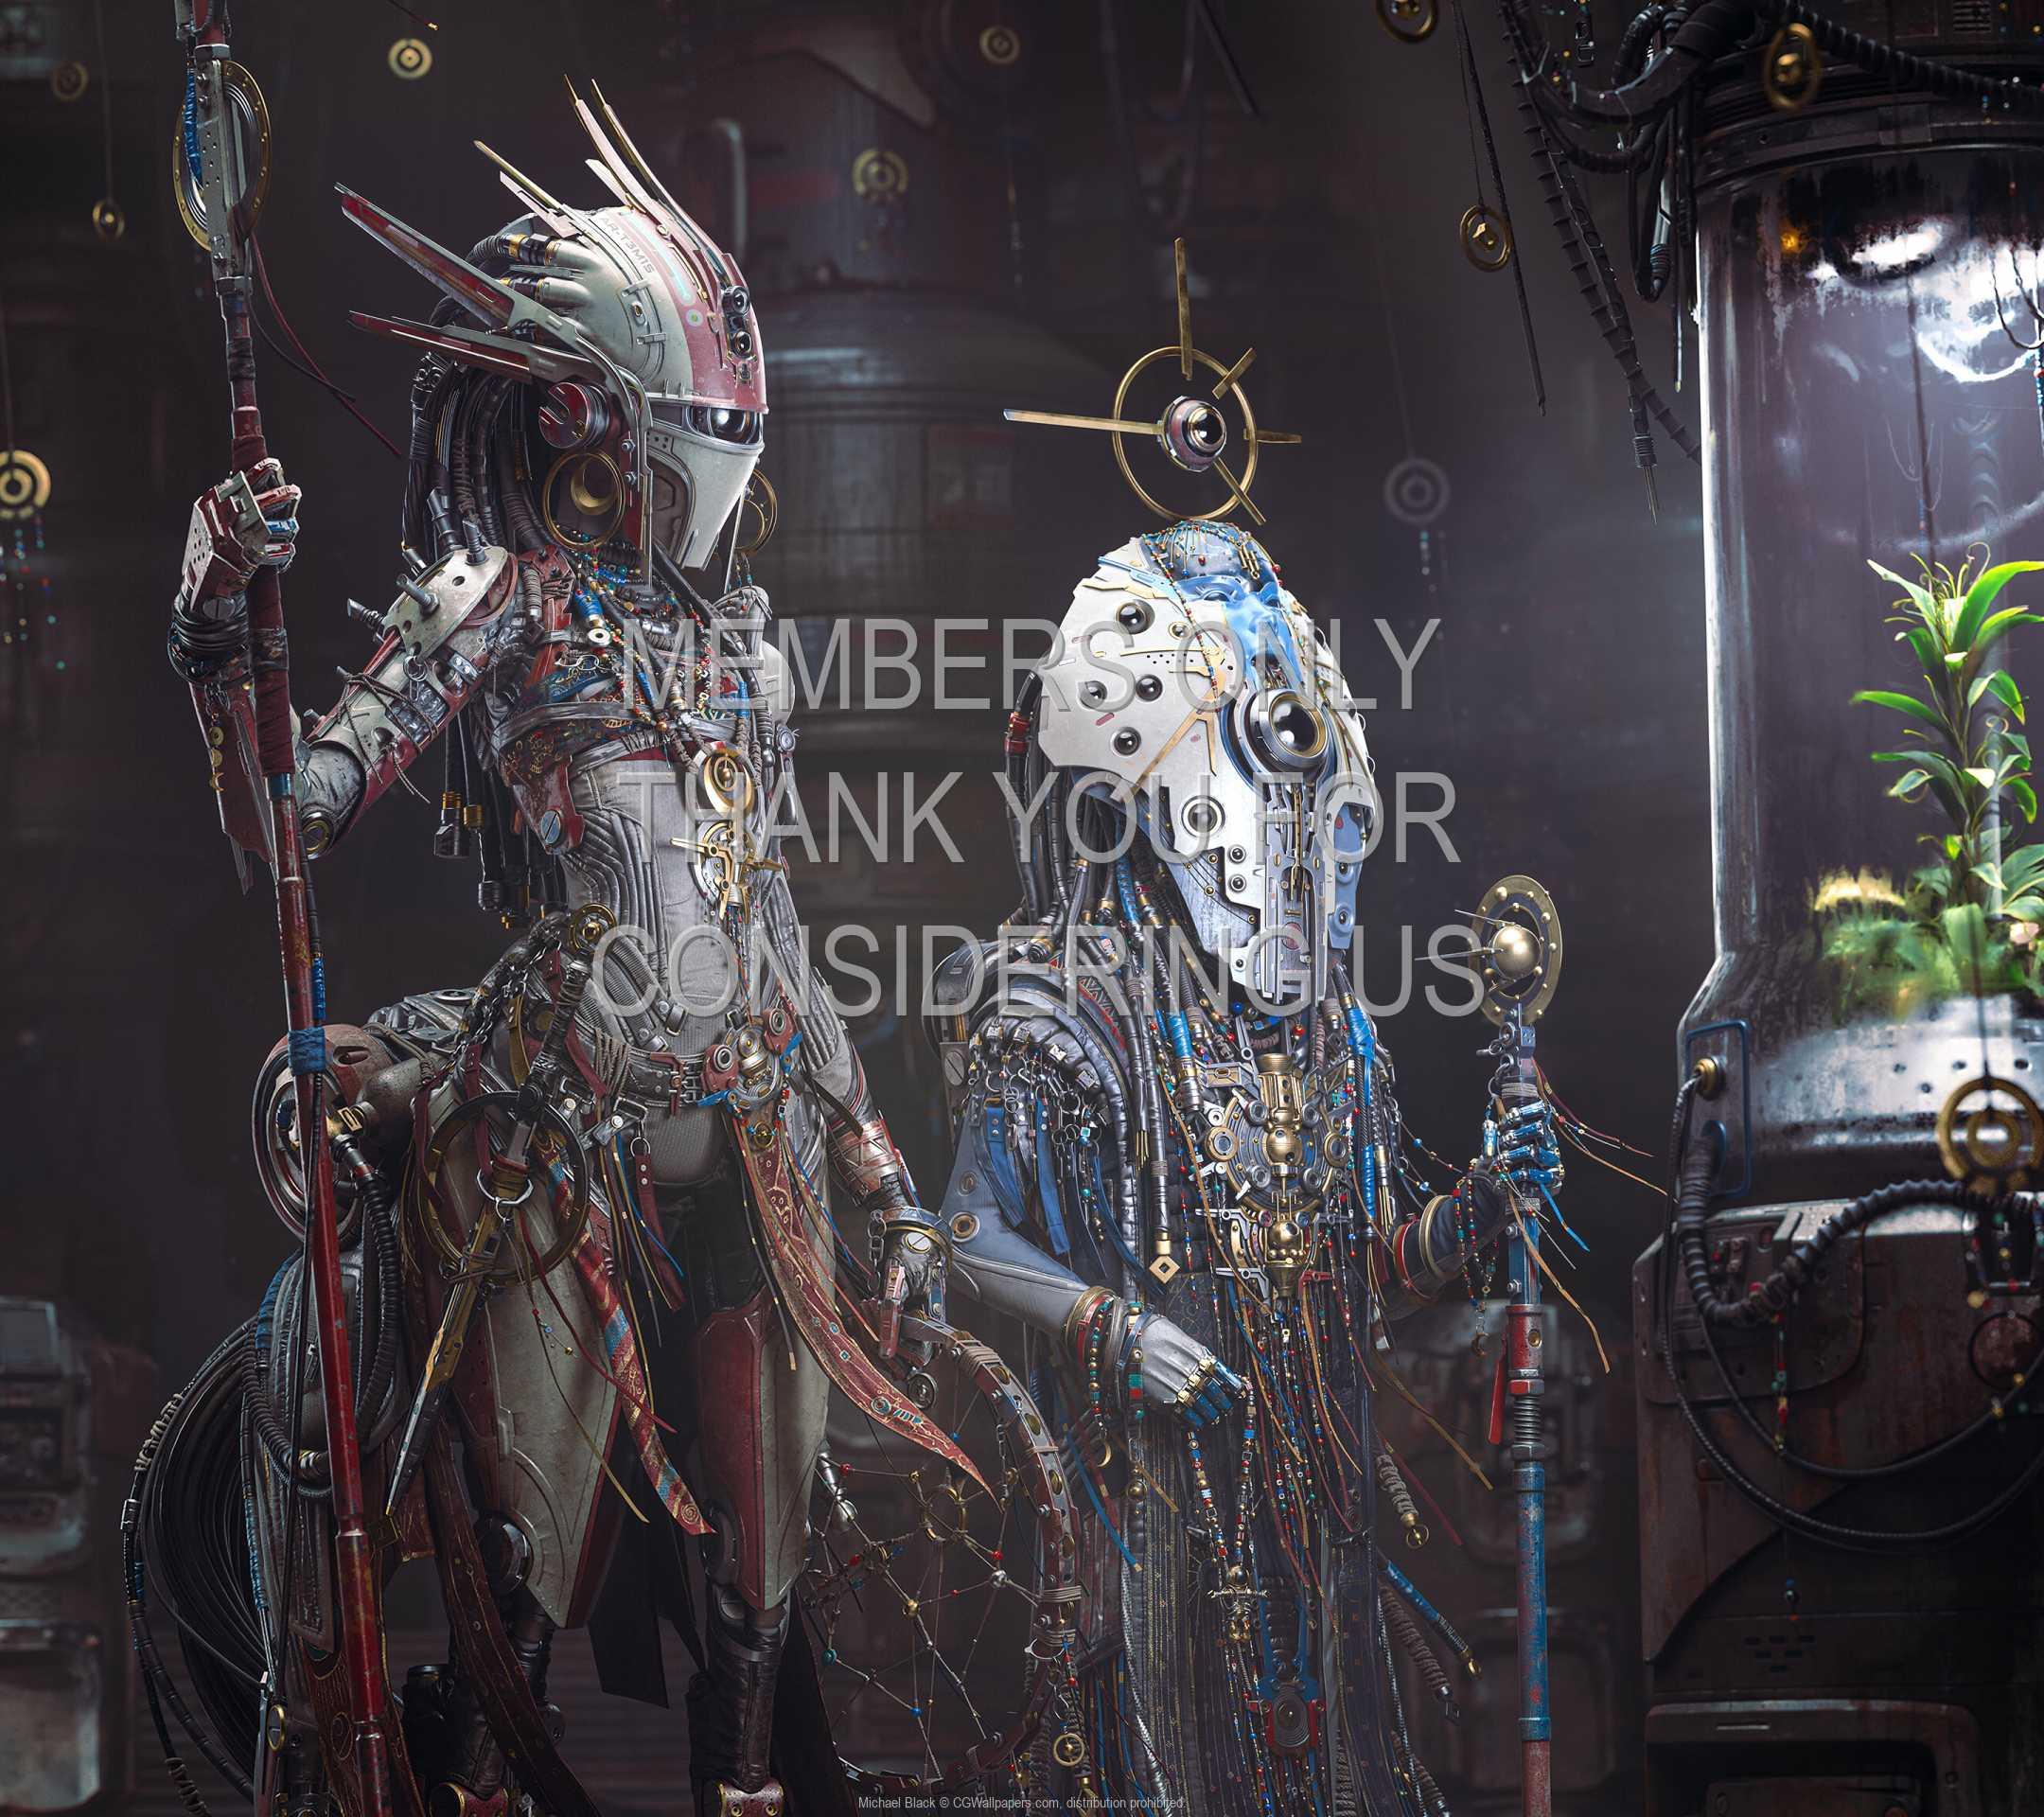 Michael Black 1080p Horizontal Mobile wallpaper or background 05